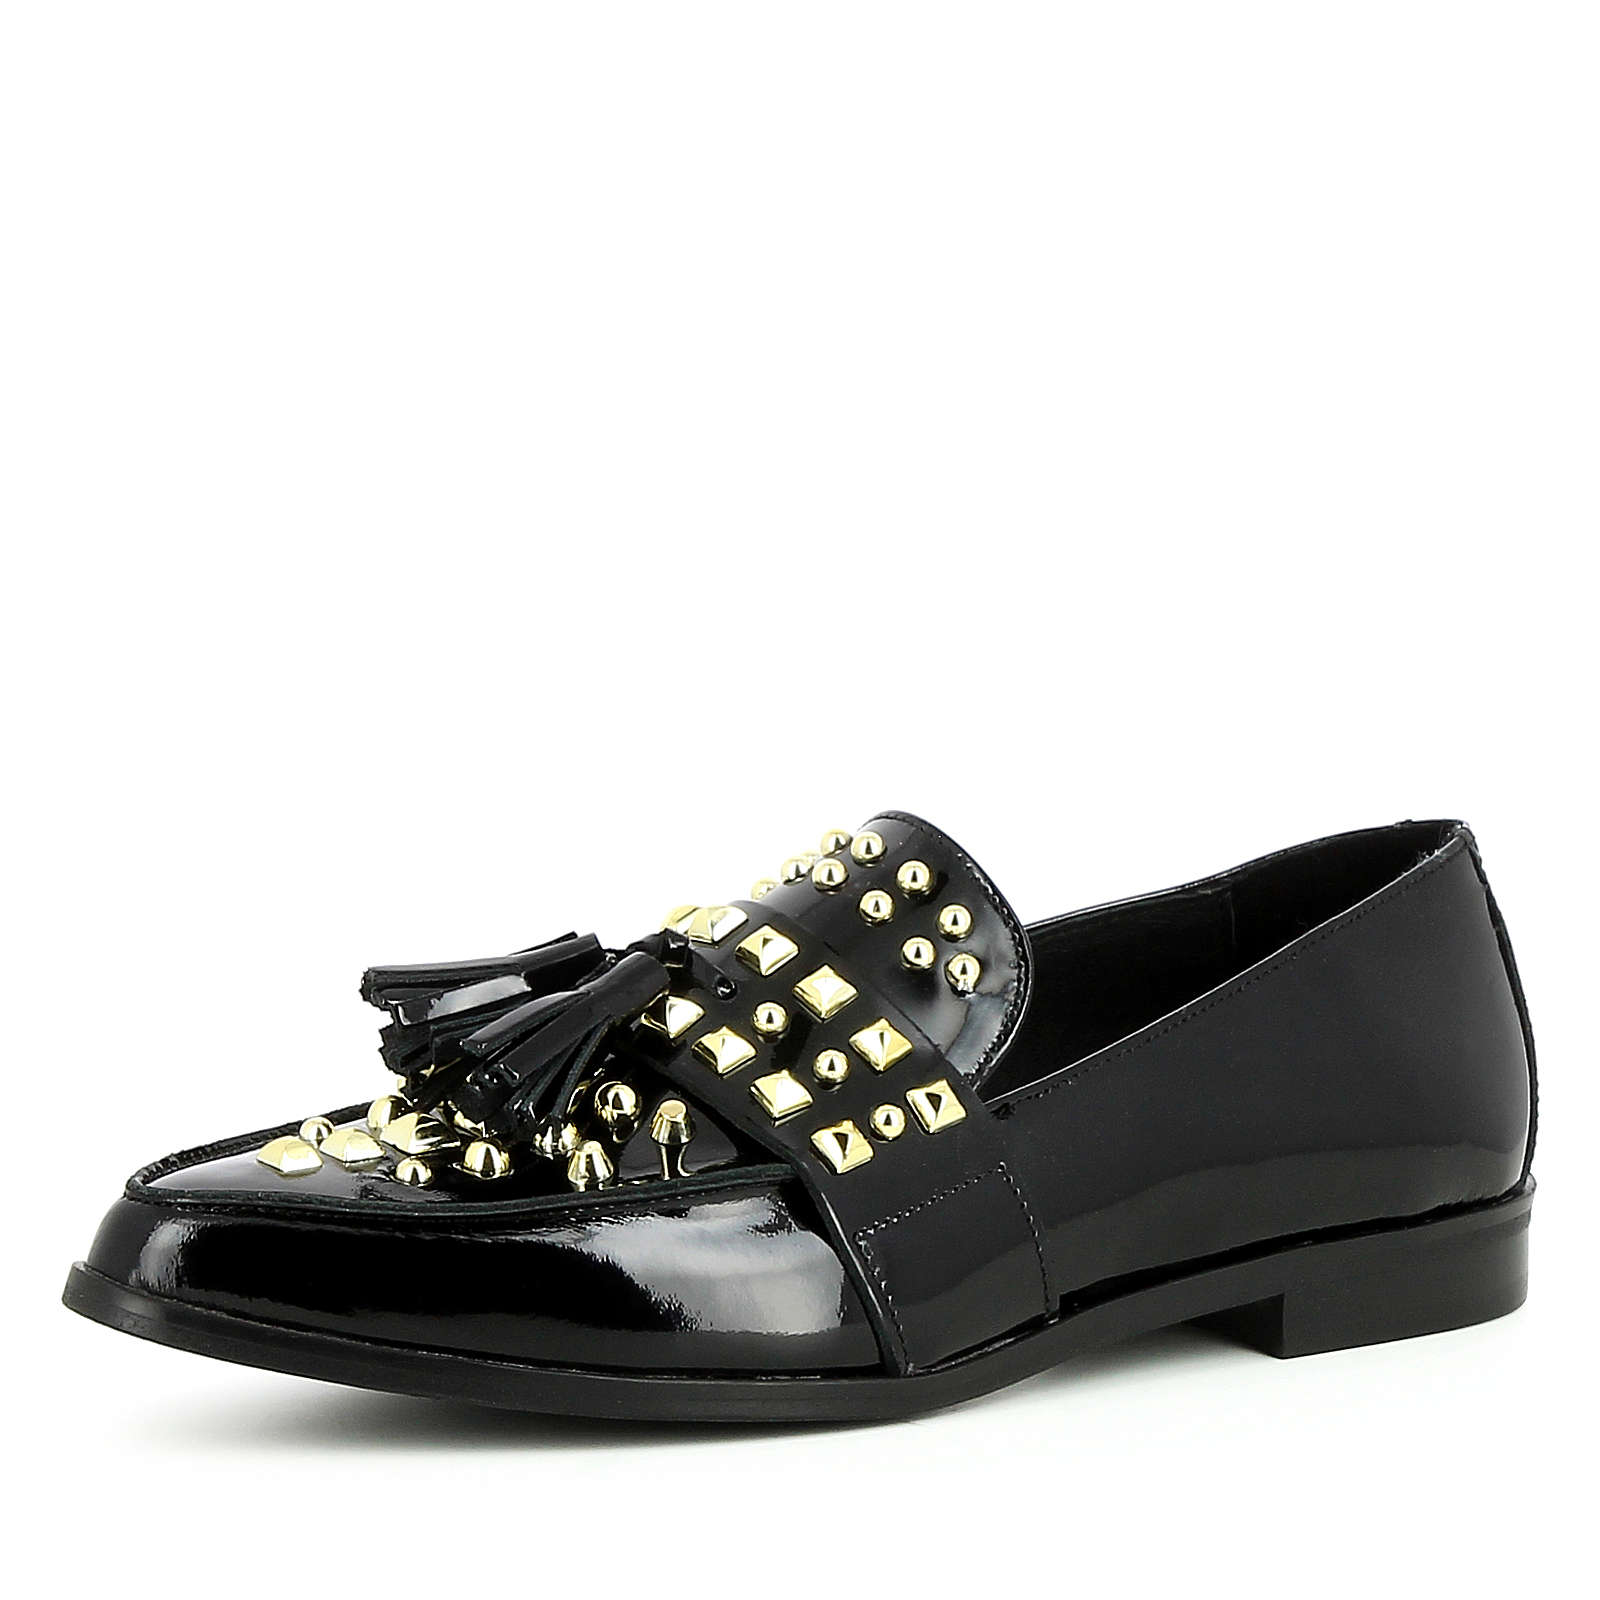 Evita Shoes Damen Slipper FILIPA Klassische Slipper schwarz Damen Gr. 38